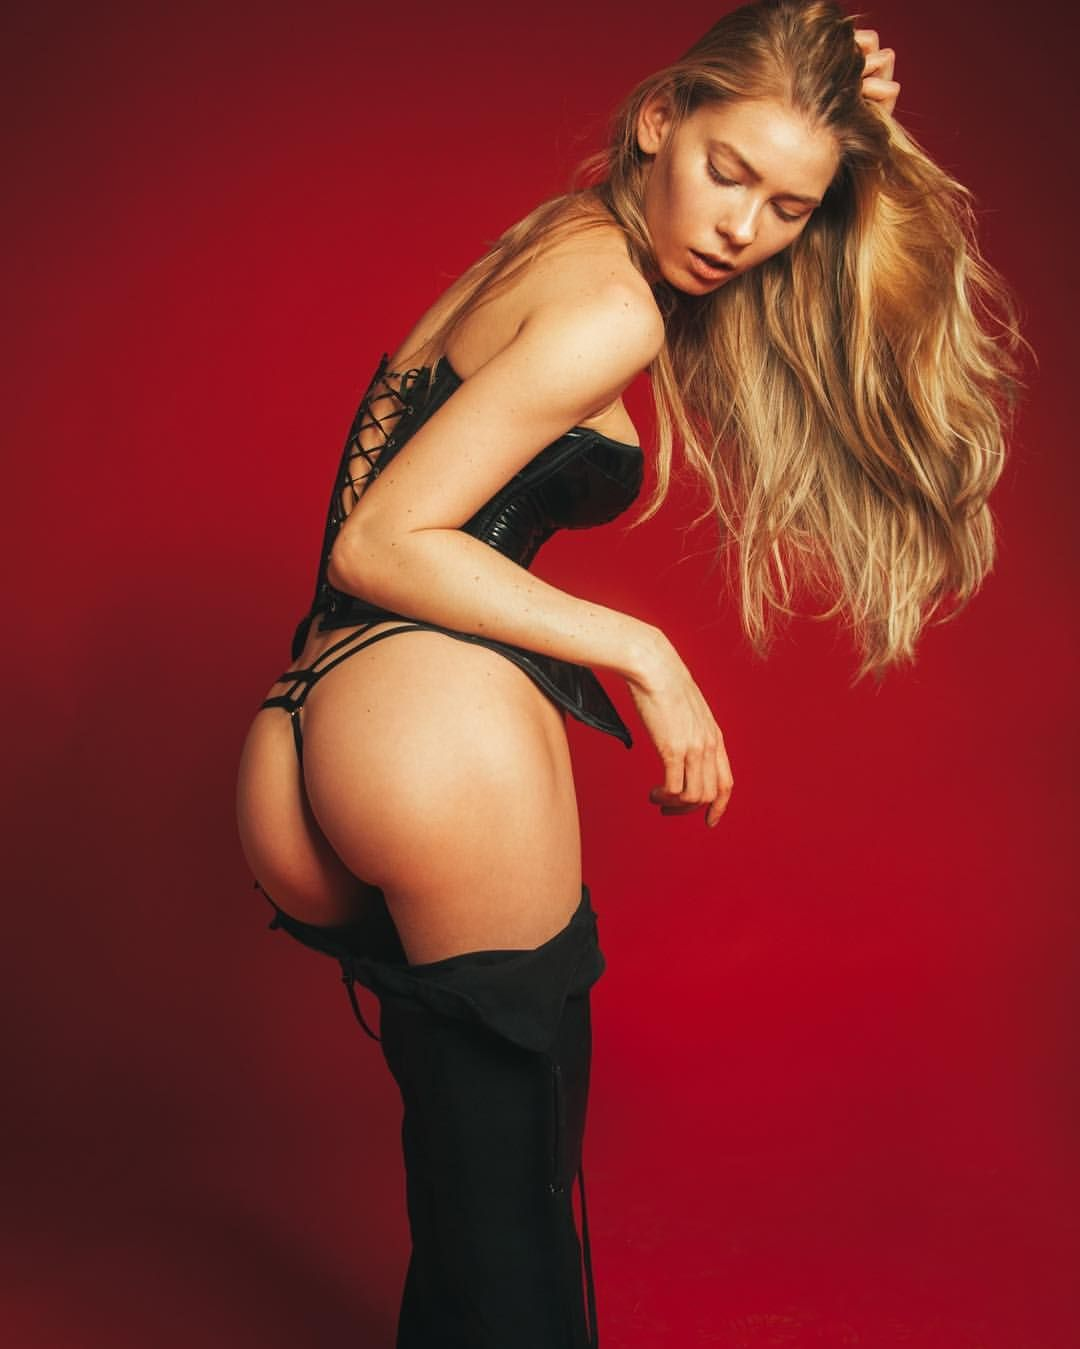 Natalie Tokeszka nude (38 fotos) Tits, Facebook, legs